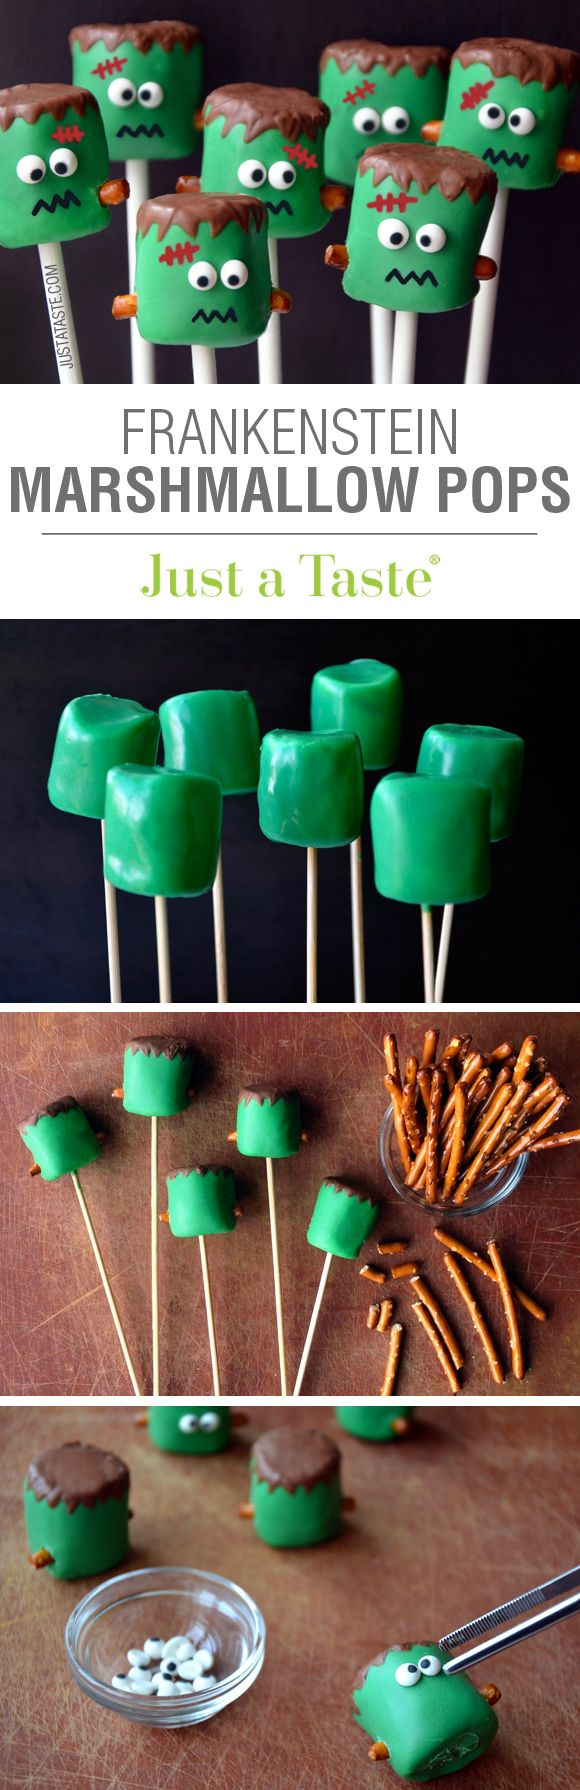 frankenstein marshmallow pops - Halloween Casserole Recipe Ideas